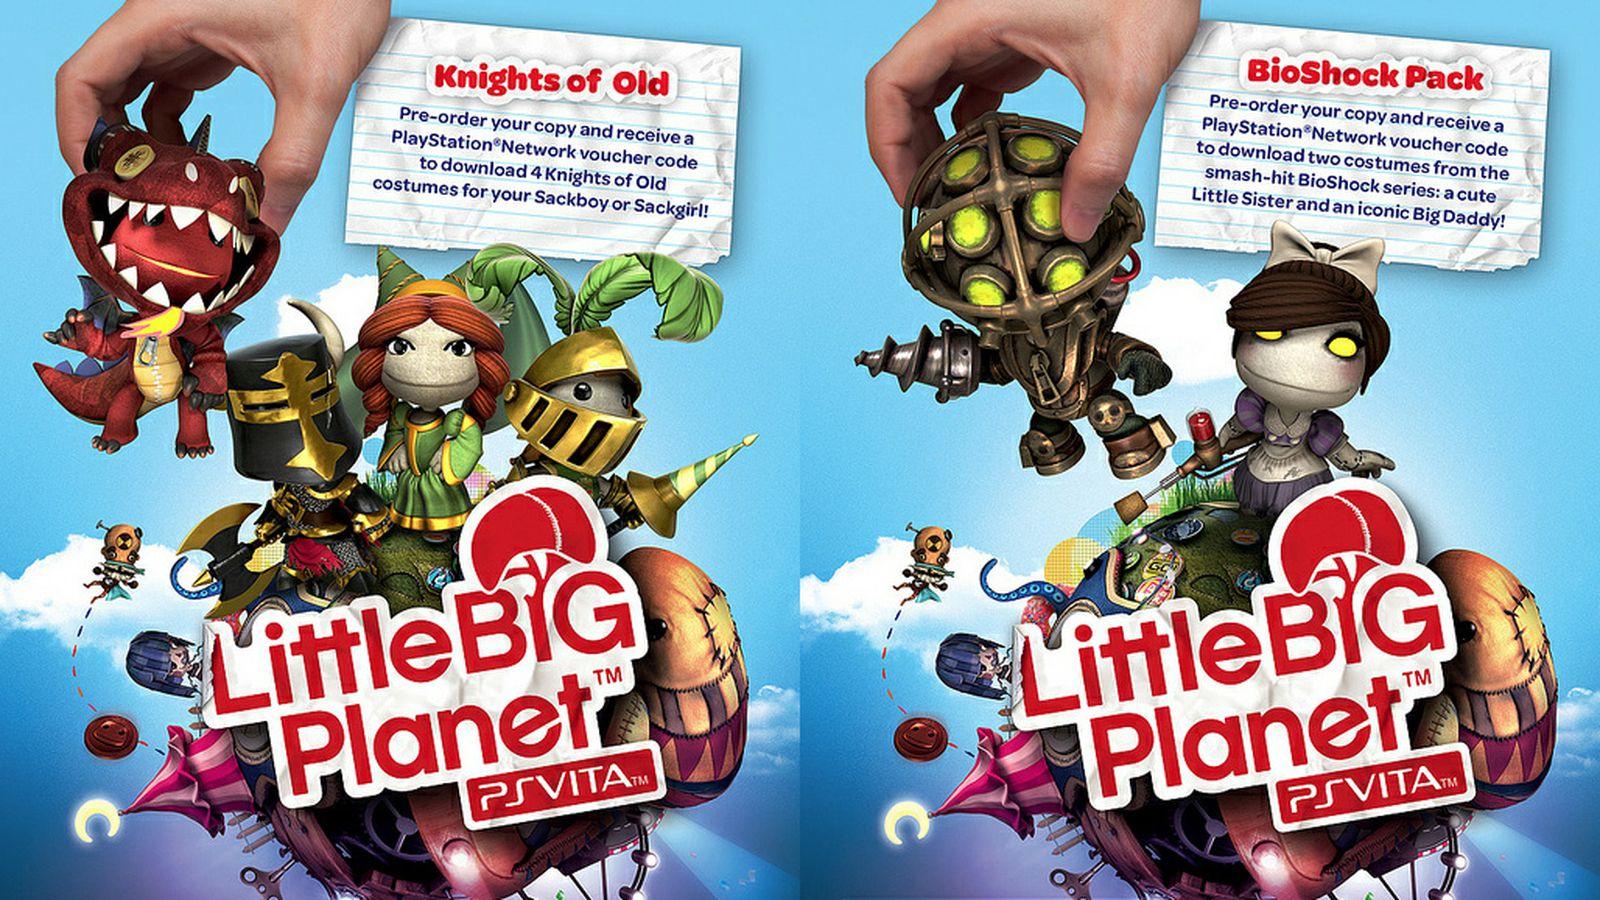 Littlebigplanet Ps Vita Gets Little Sister Big Daddy Bioshock